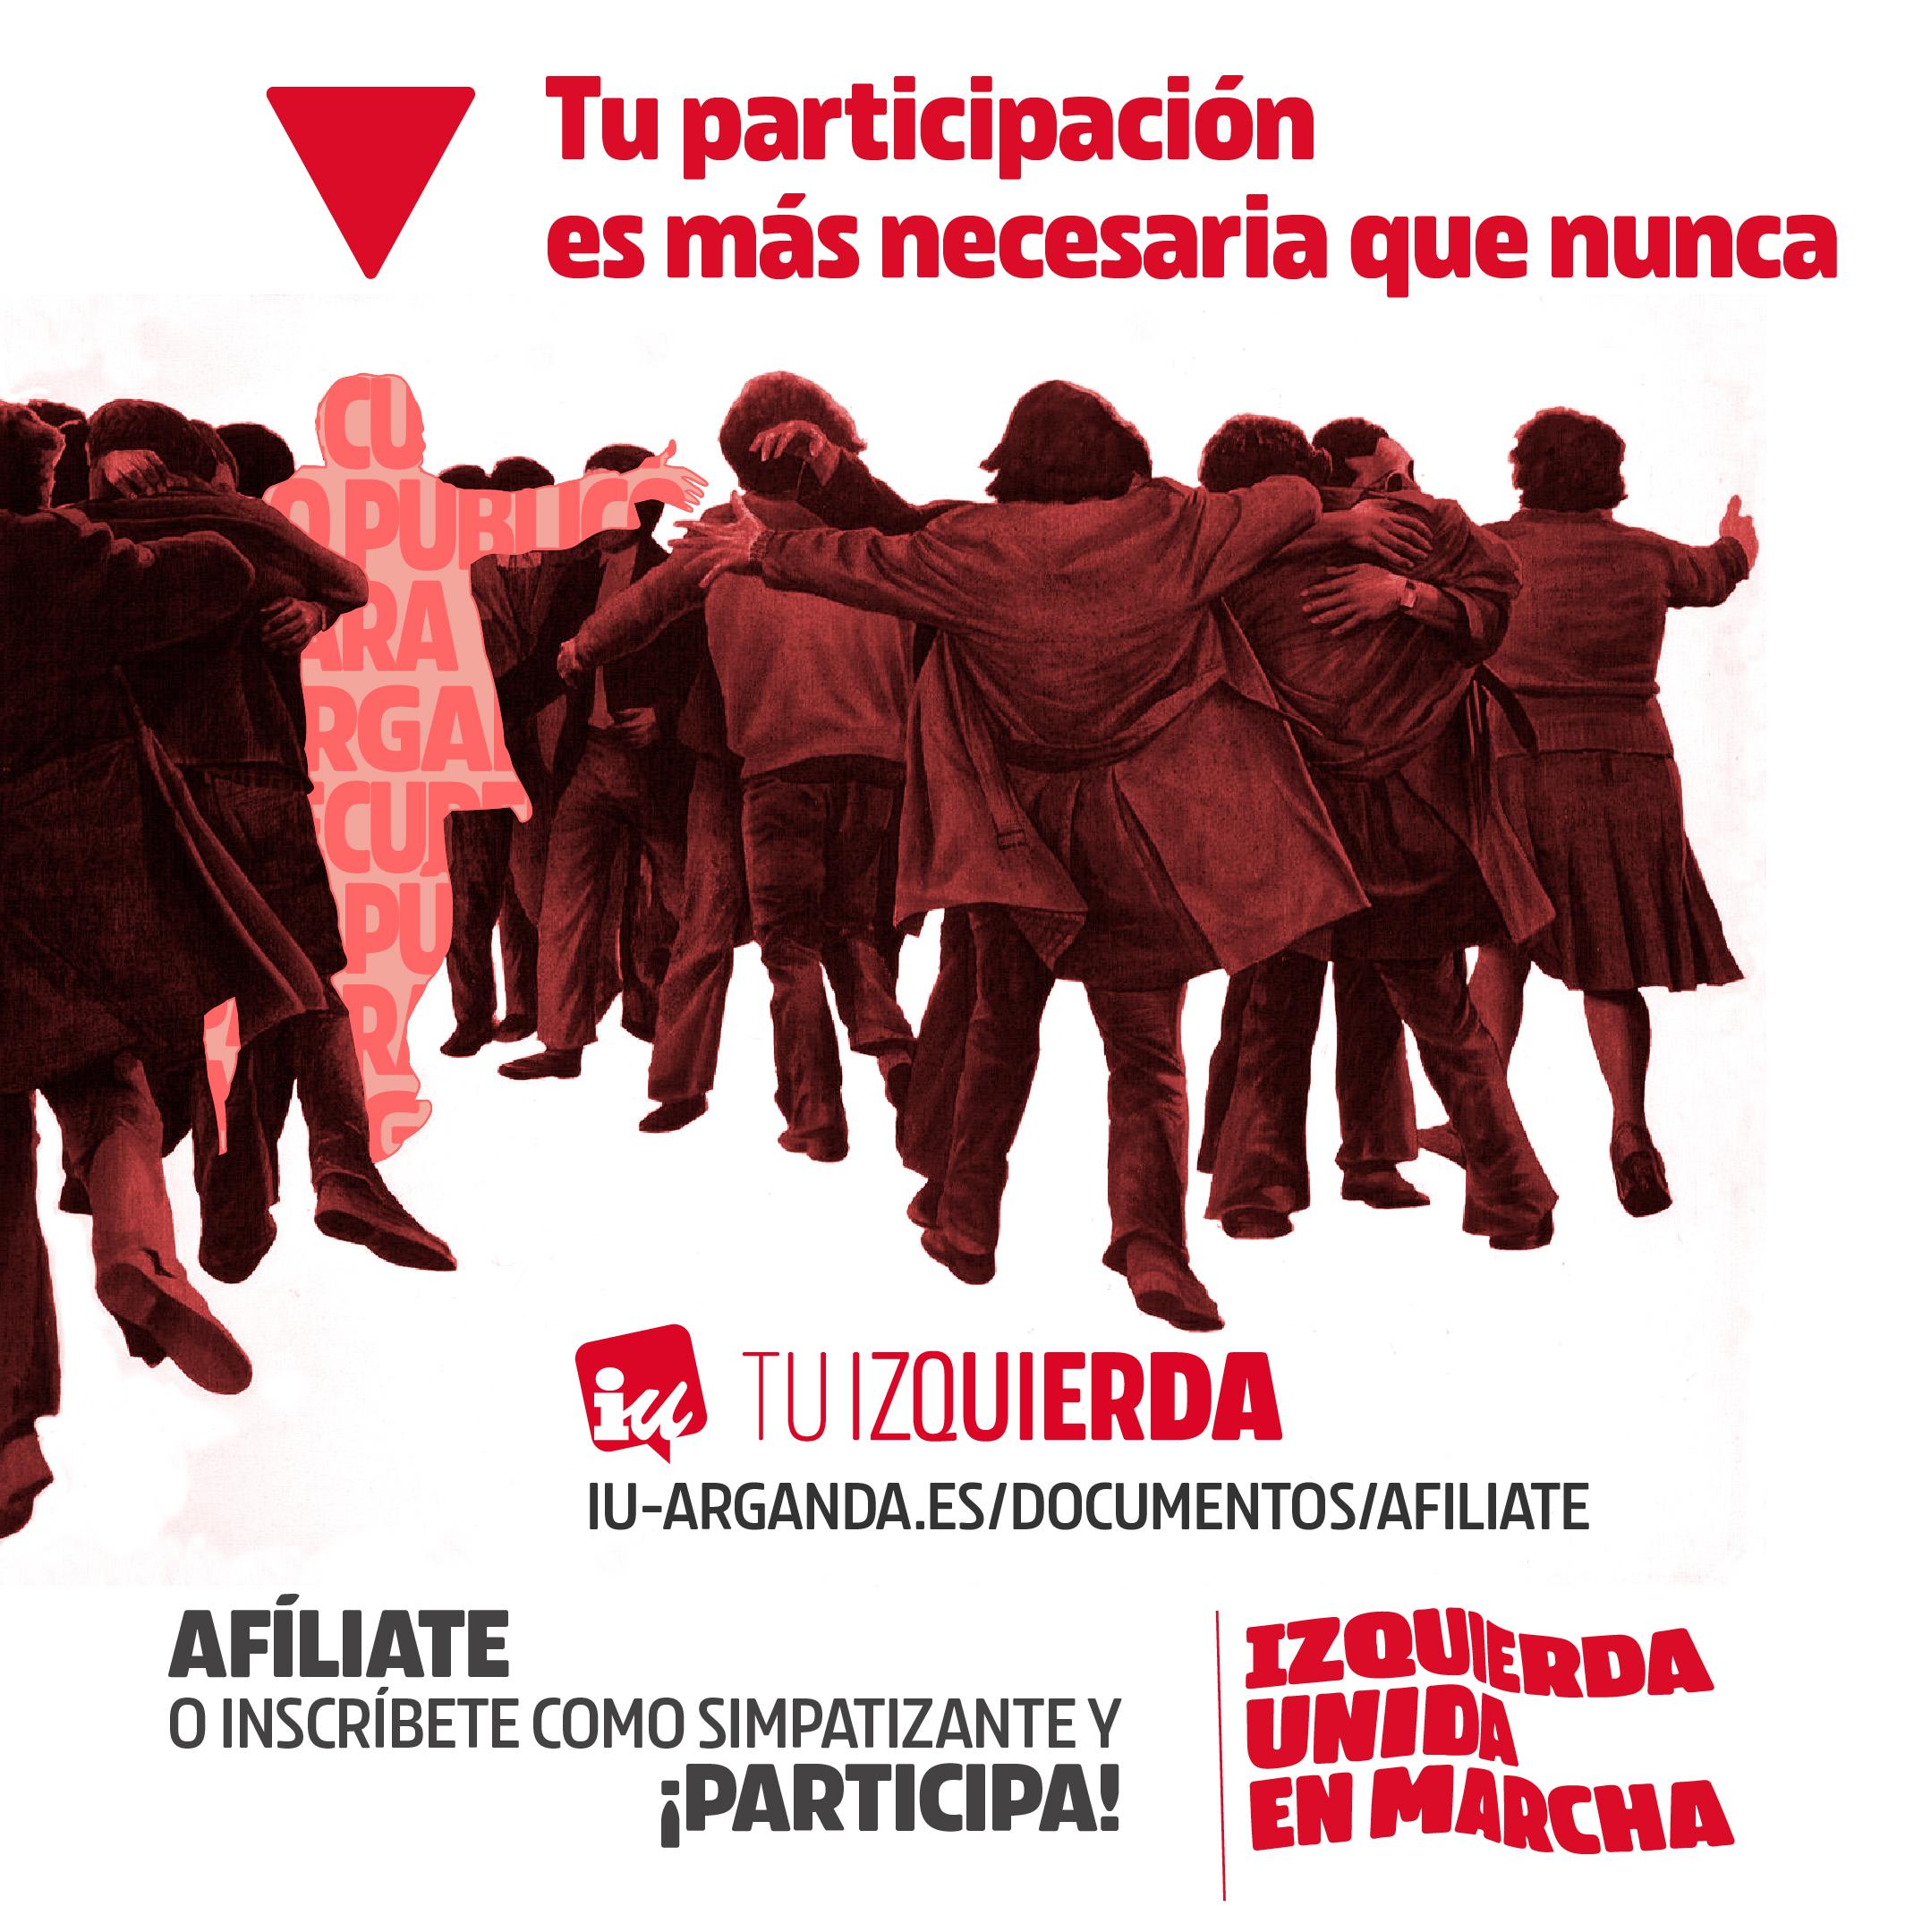 Afiliate y participa